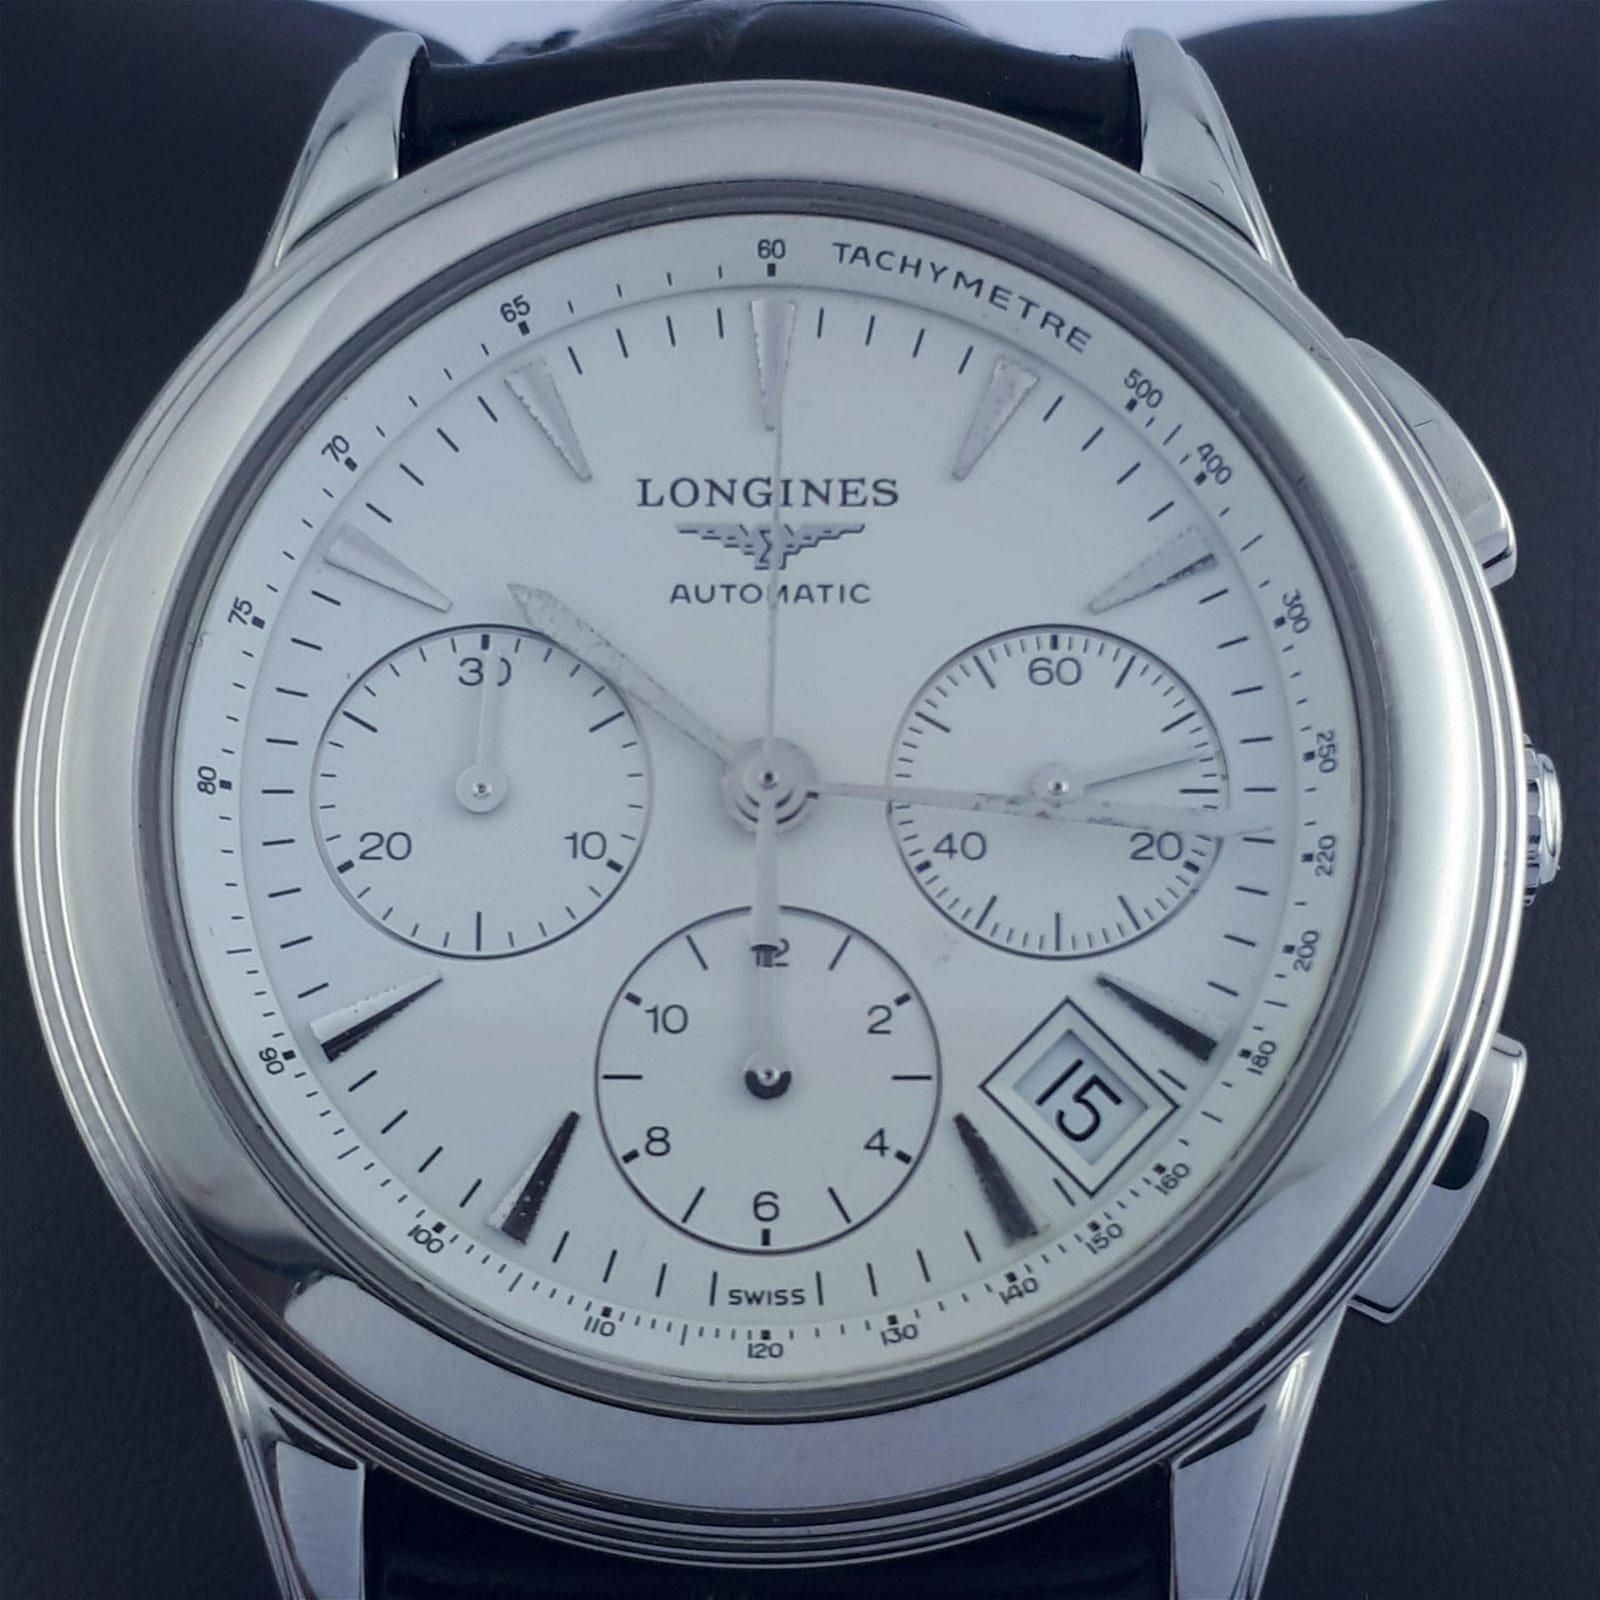 Longines - Flagship Automatic Chronograph - L.650.2 -